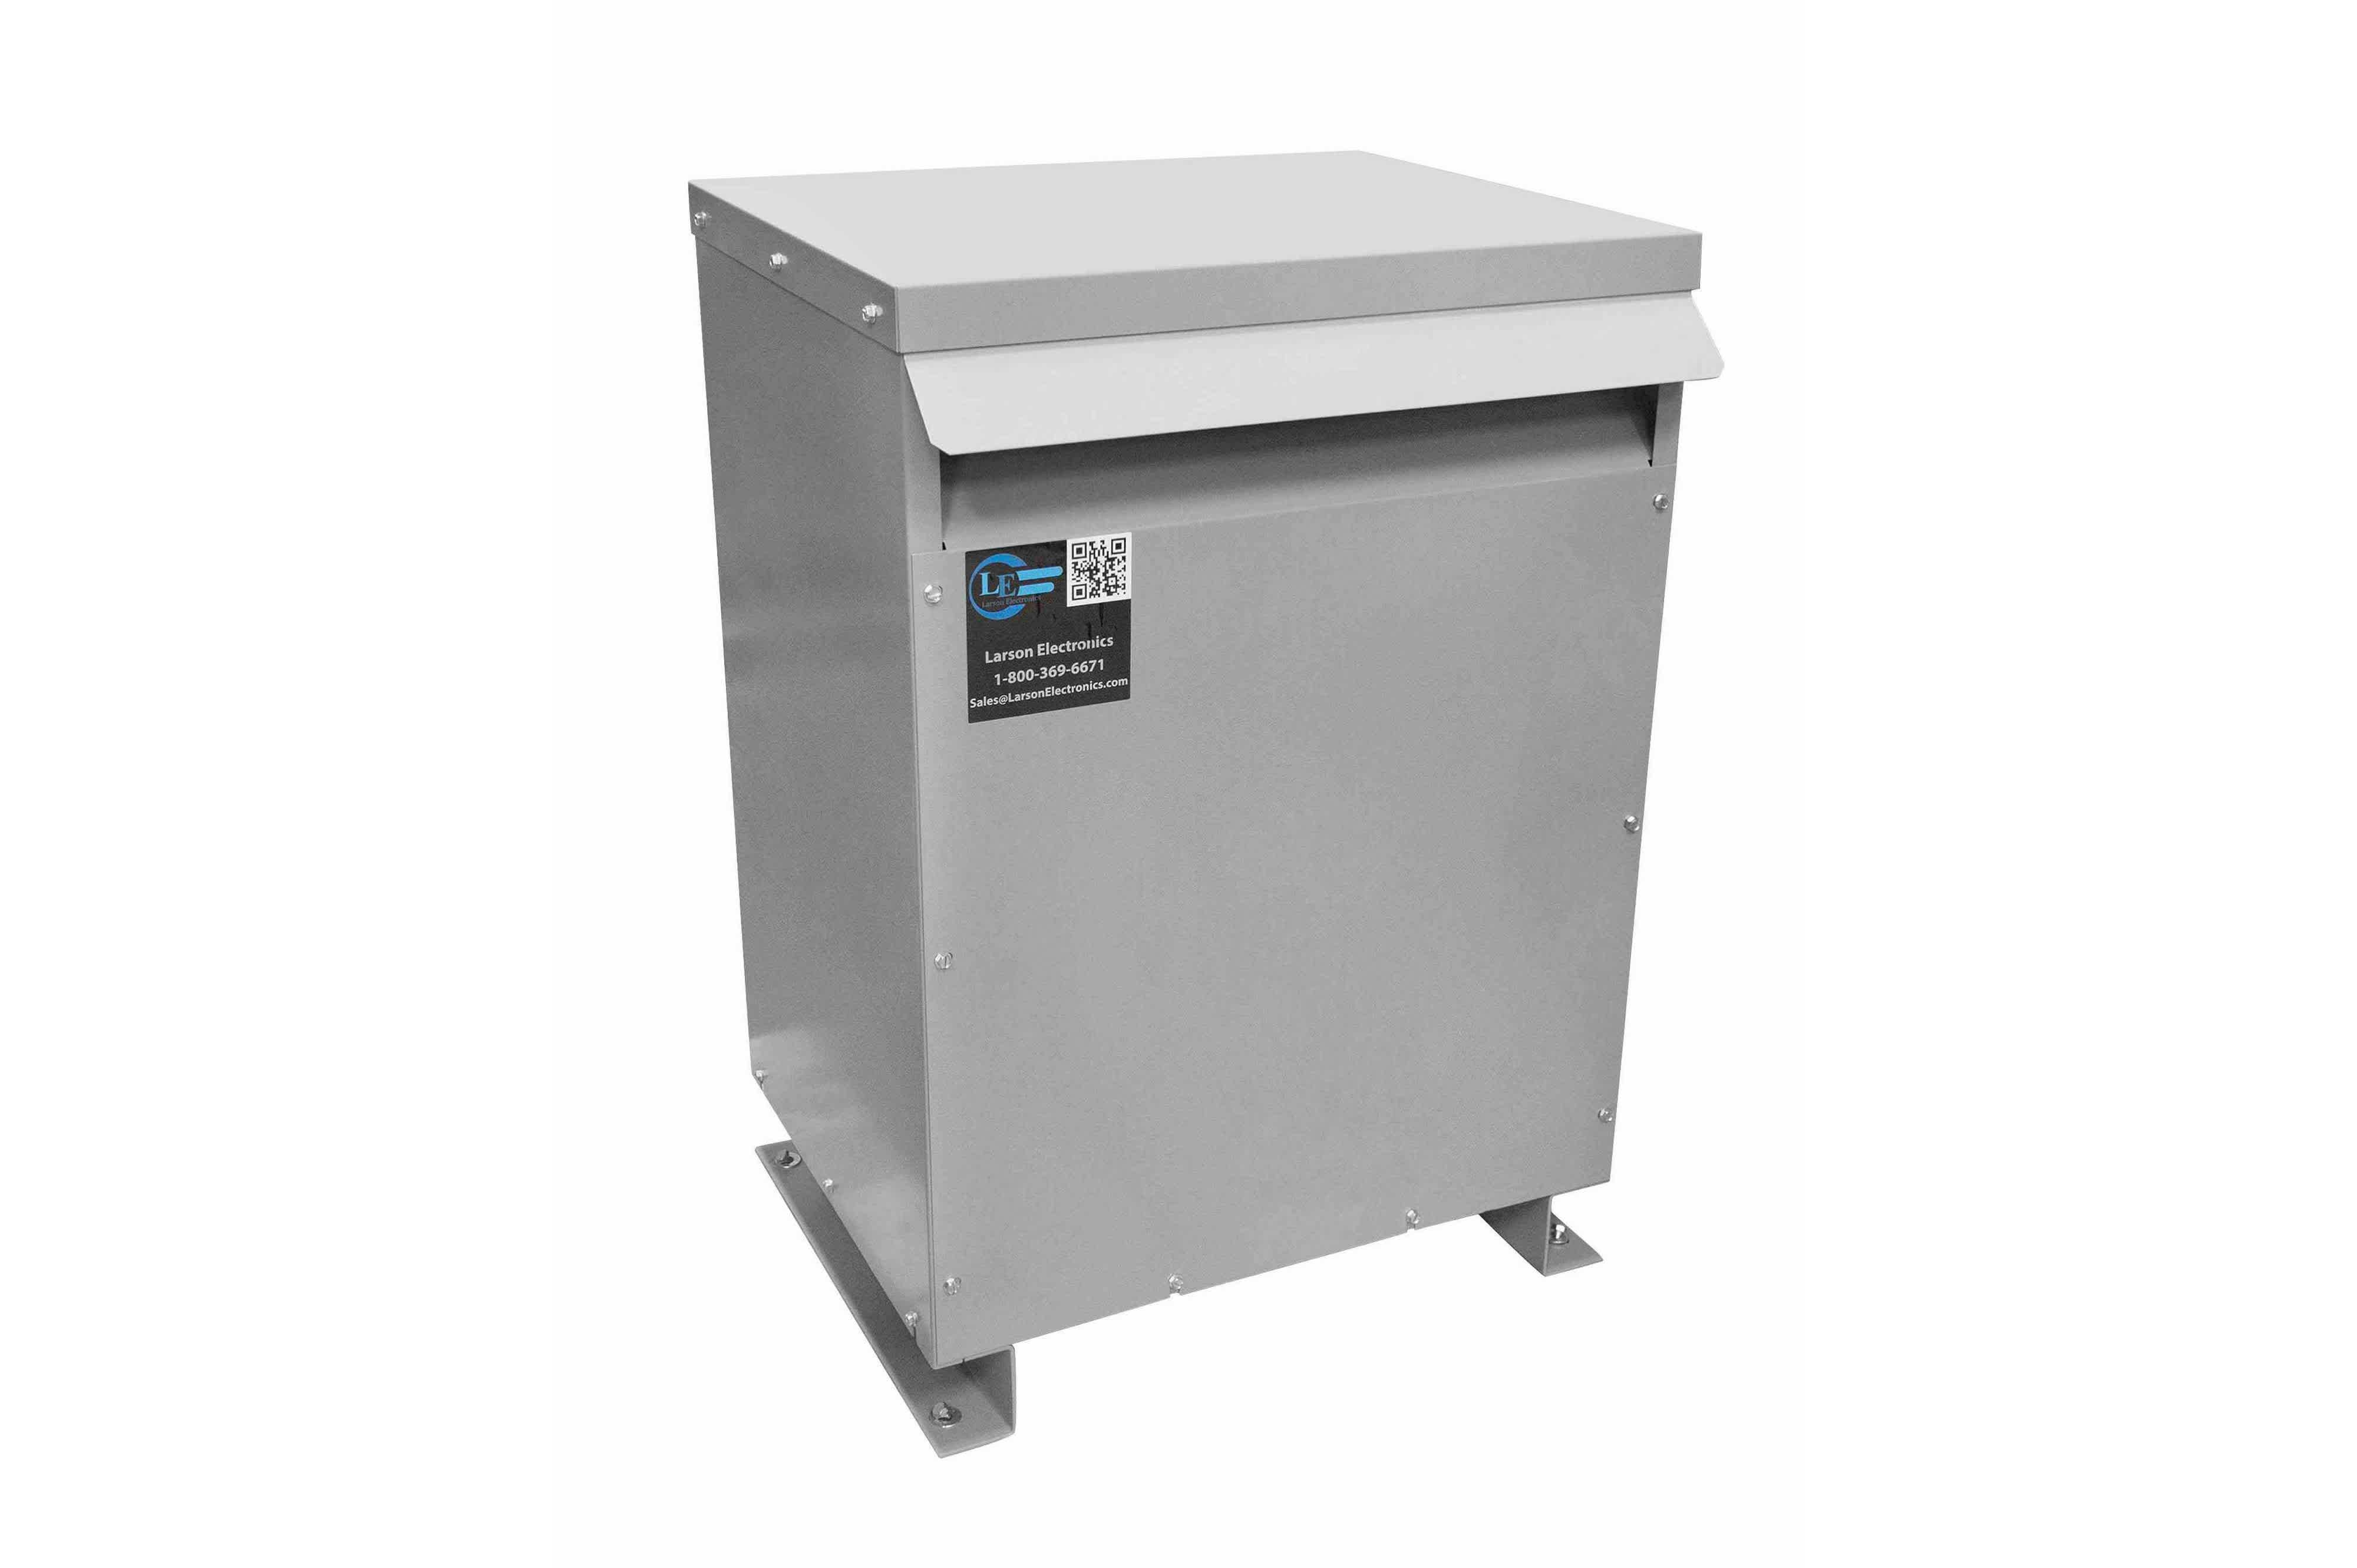 47.5 kVA 3PH Isolation Transformer, 480V Wye Primary, 575Y/332 Wye-N Secondary, N3R, Ventilated, 60 Hz